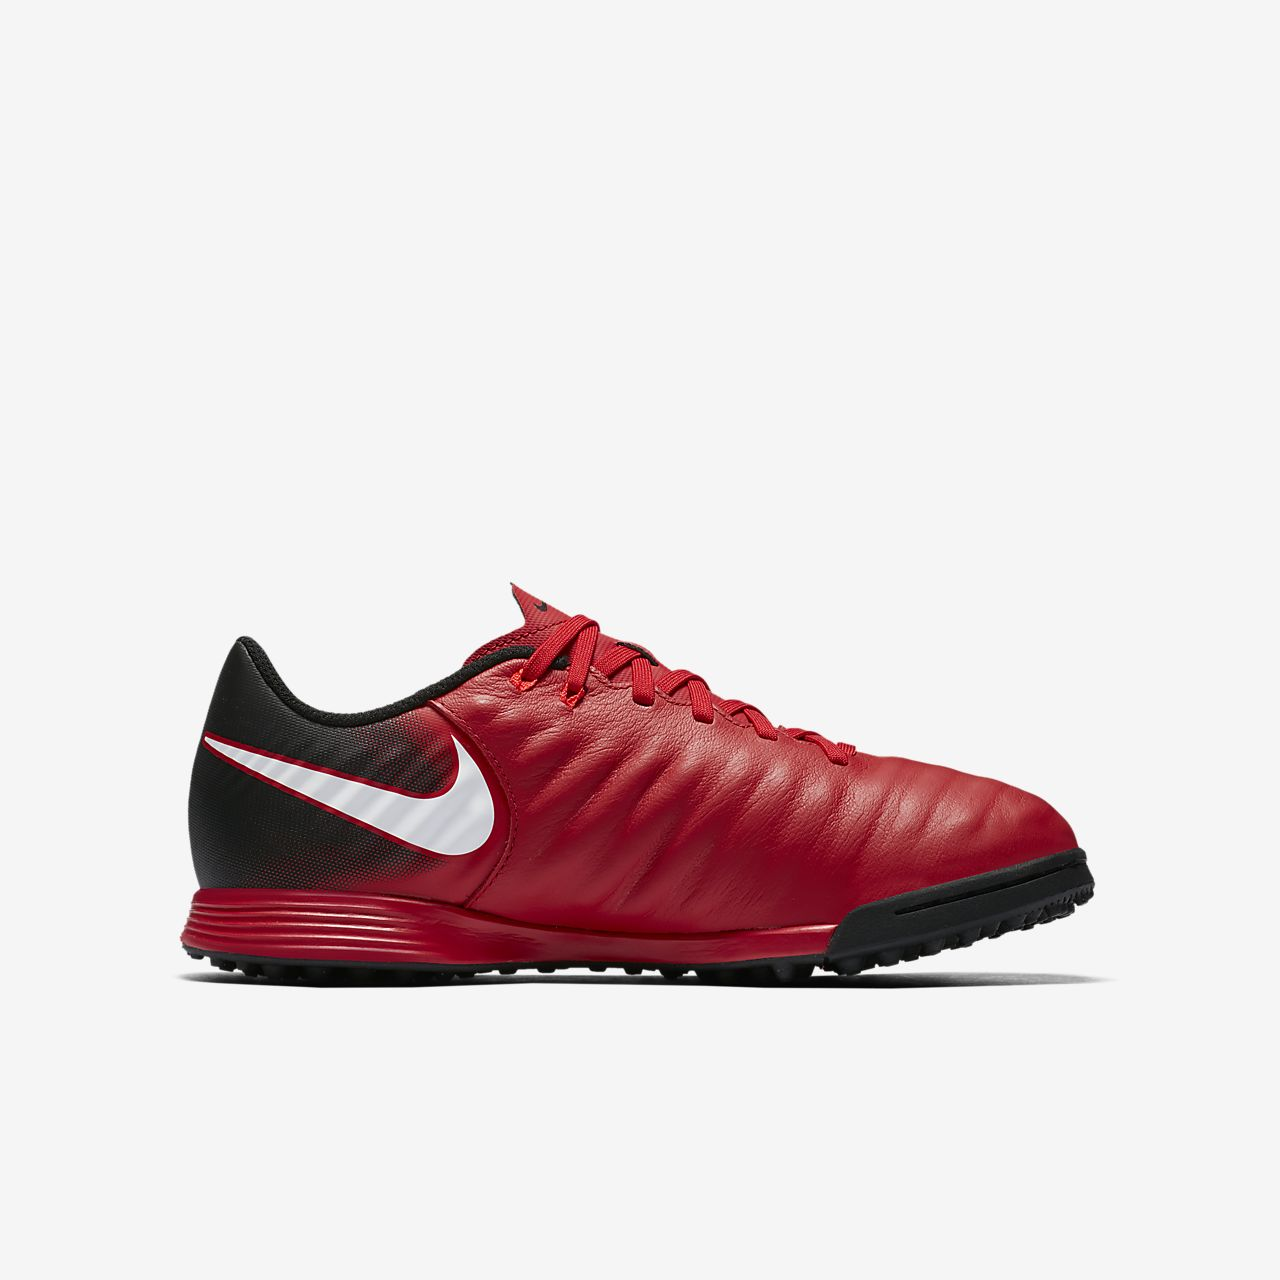 ... Nike Jr. TiempoX Ligera IV Older Kids' Artificial-Turf Football Shoe